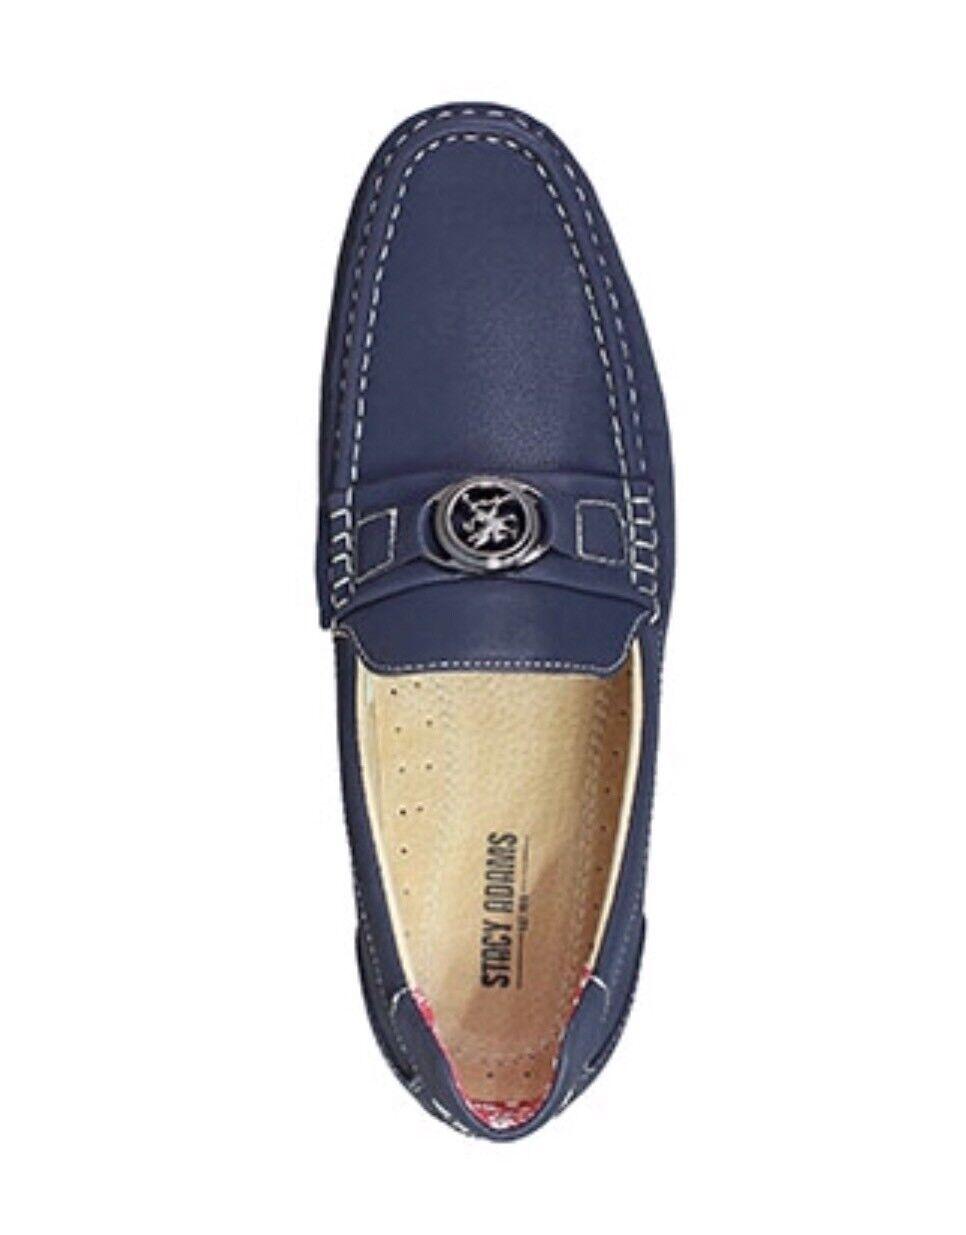 Stacy Adams 13M Loafer Blue Driving Loafer 13M Moccasins 25173-410 c0151d